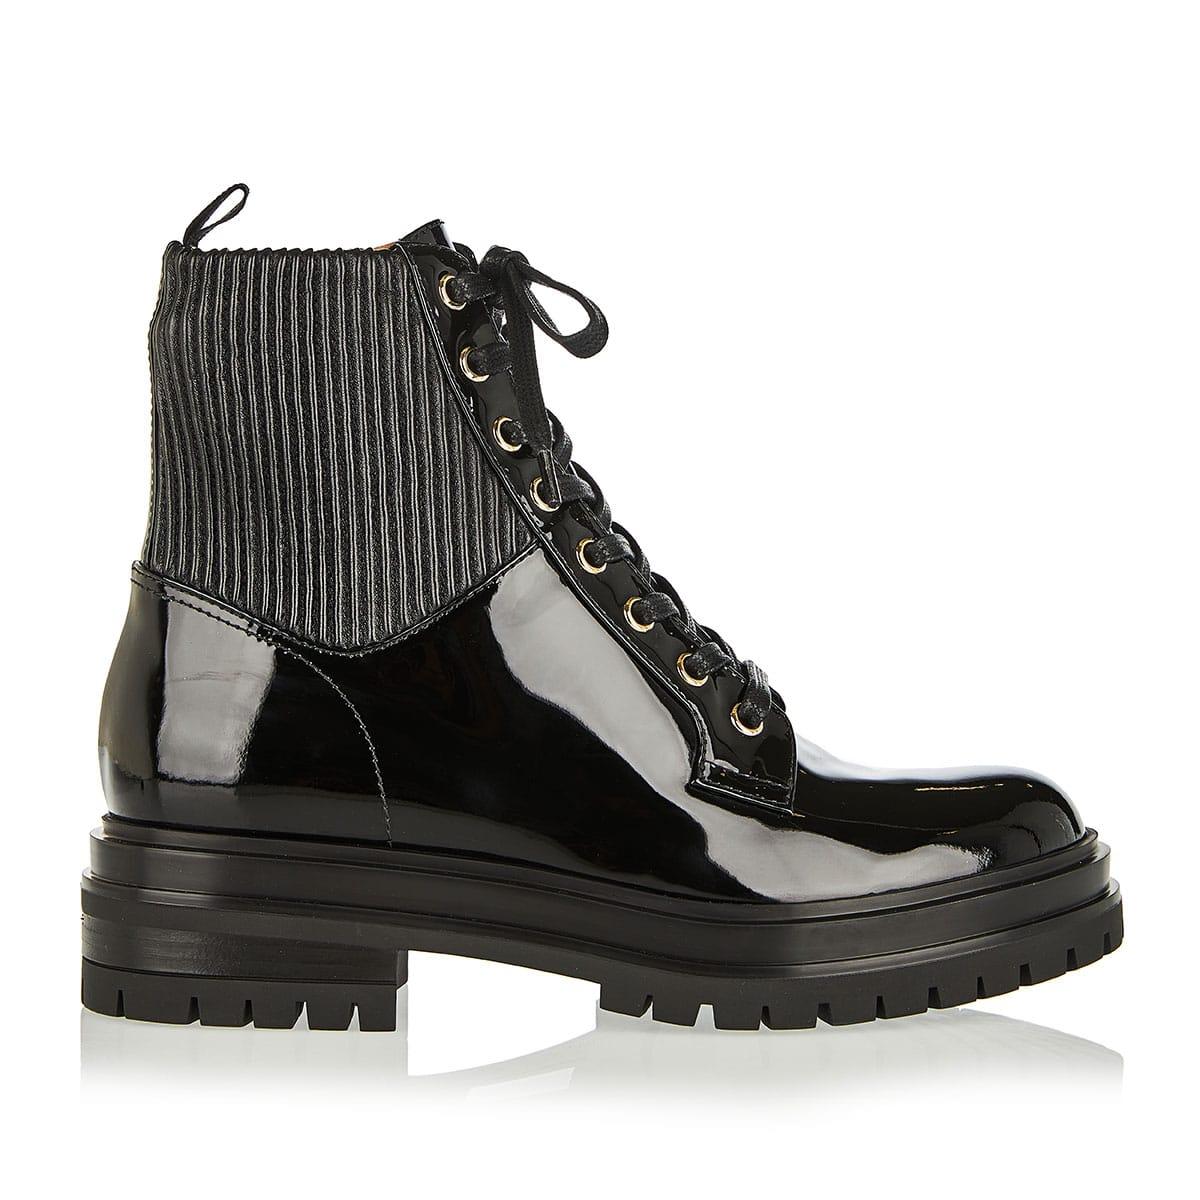 Martis 20 lace-up patent boots